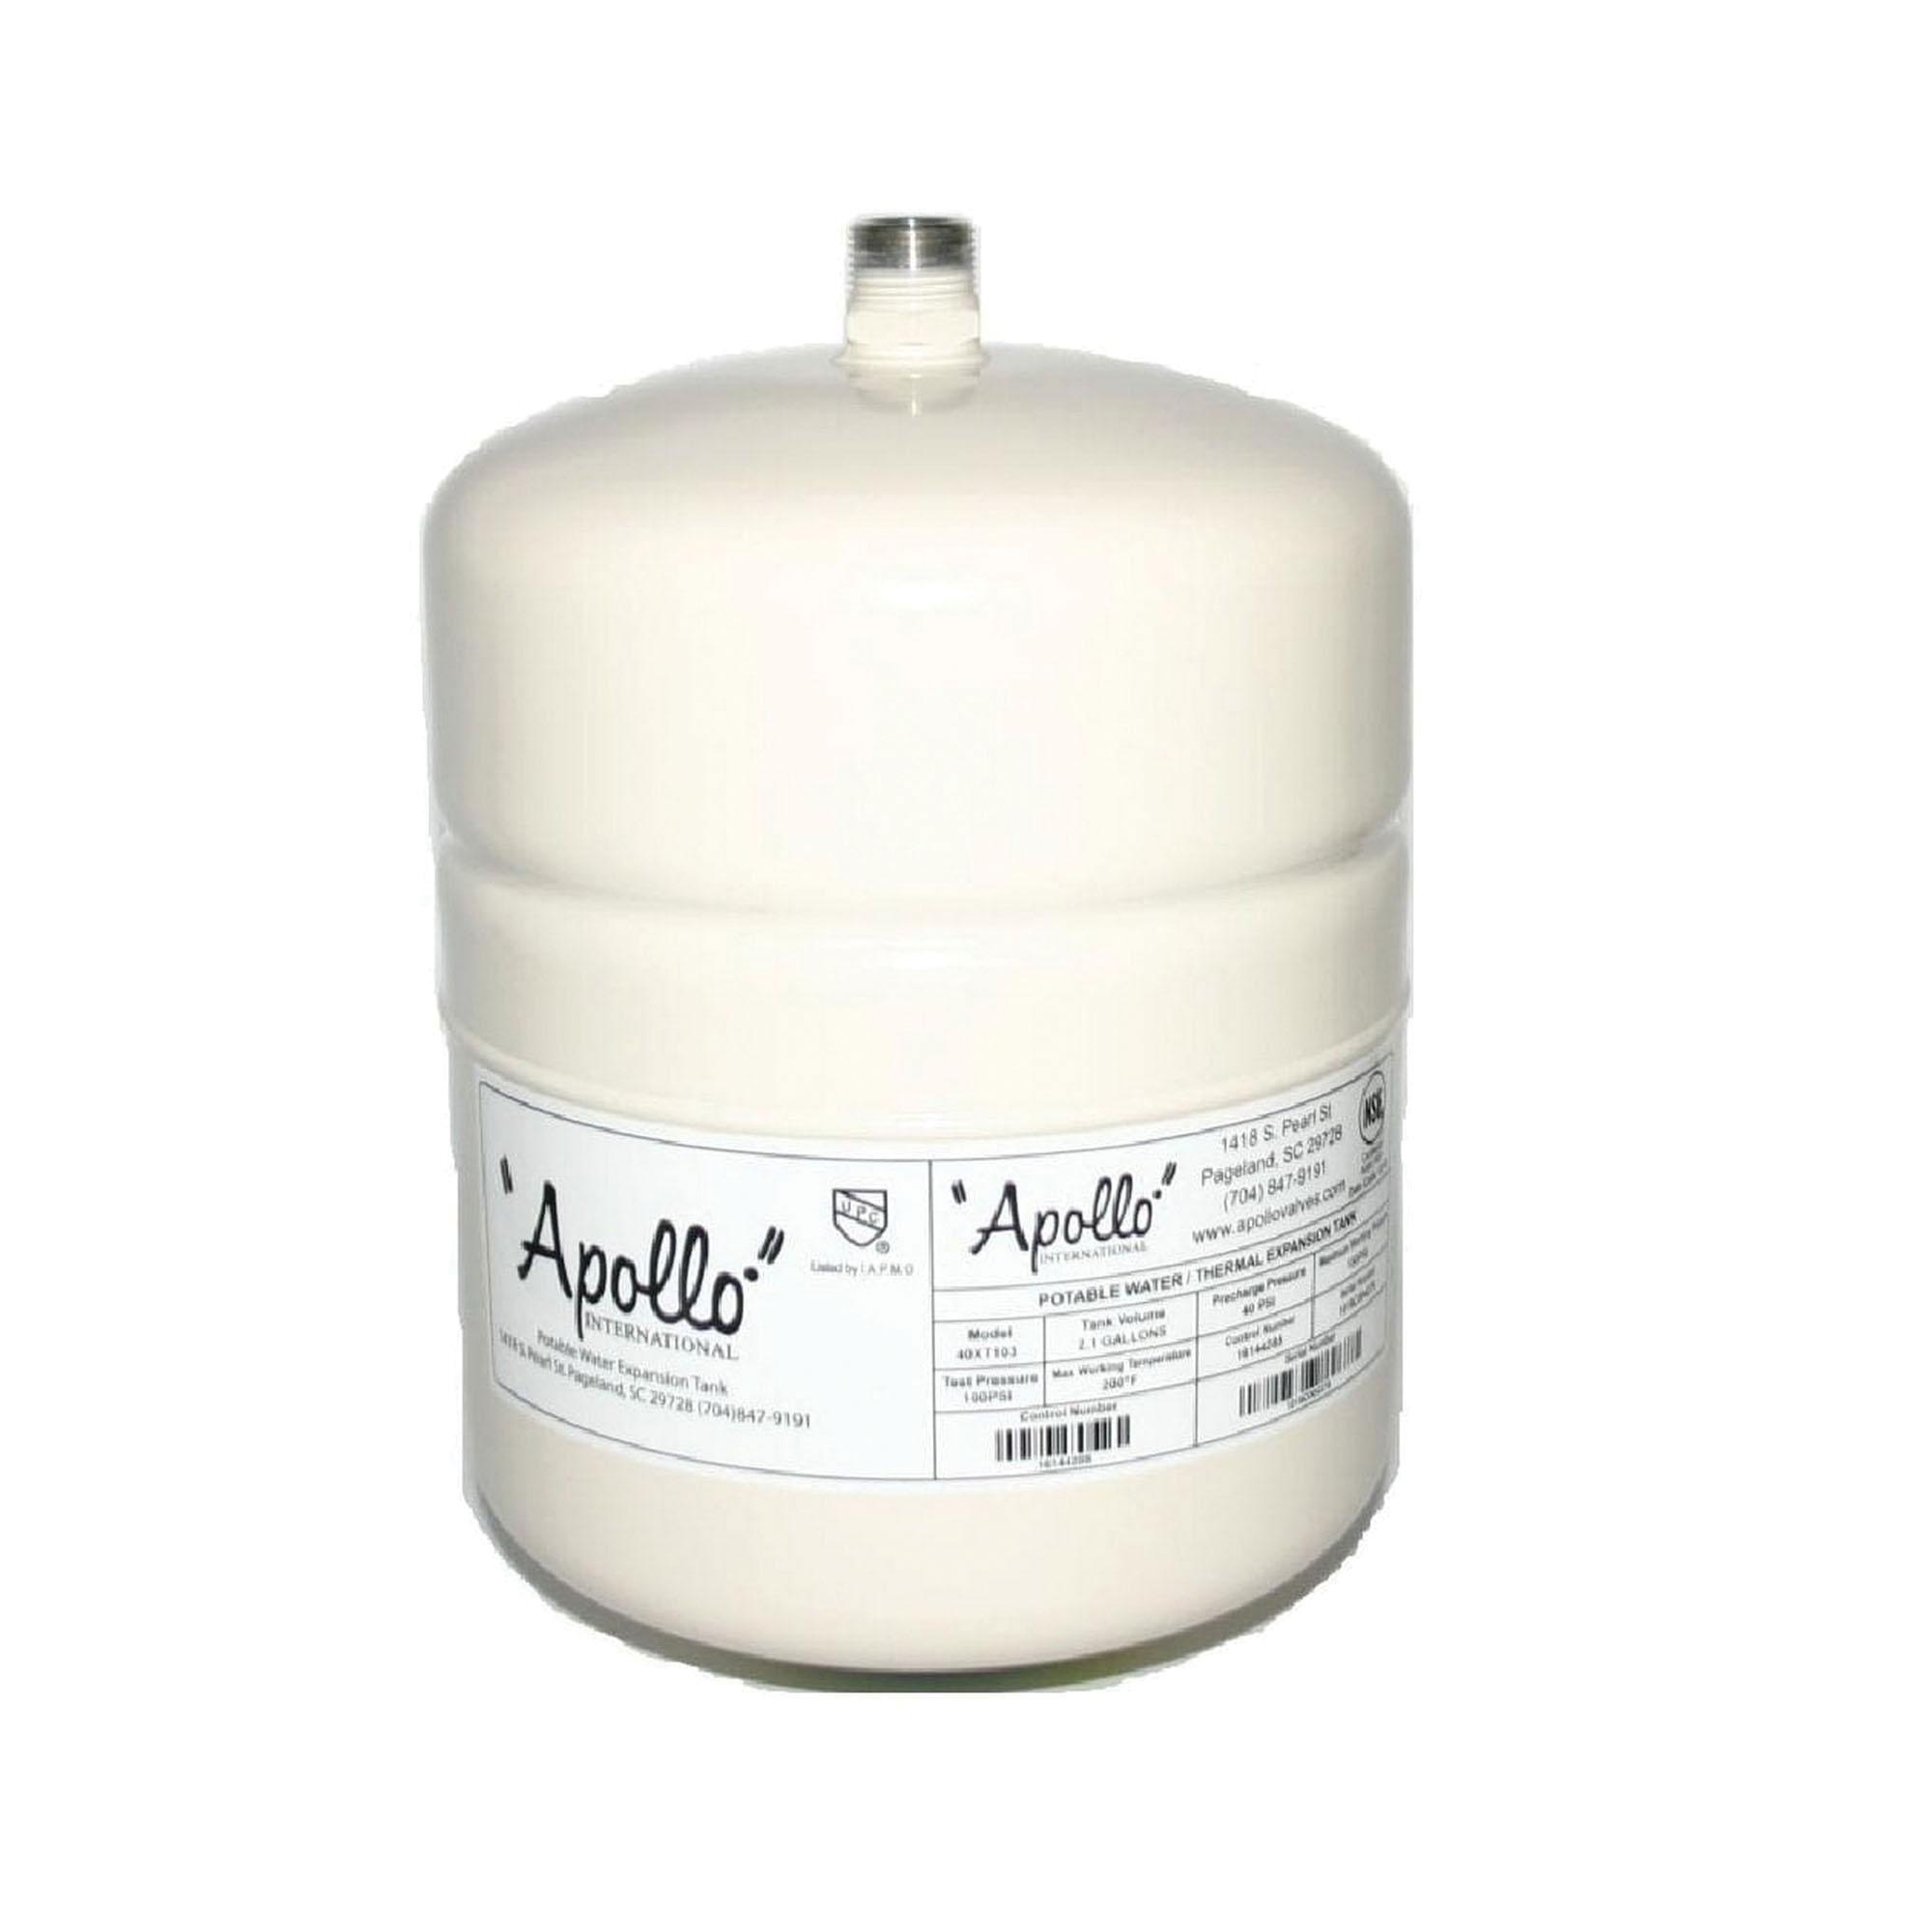 Apollo® 40XT1-04 Triple Coated Epoxy Almond Drawn Steel Lead Free Portable Expansion Tank, 2.1 gal, 3/4 in NPT